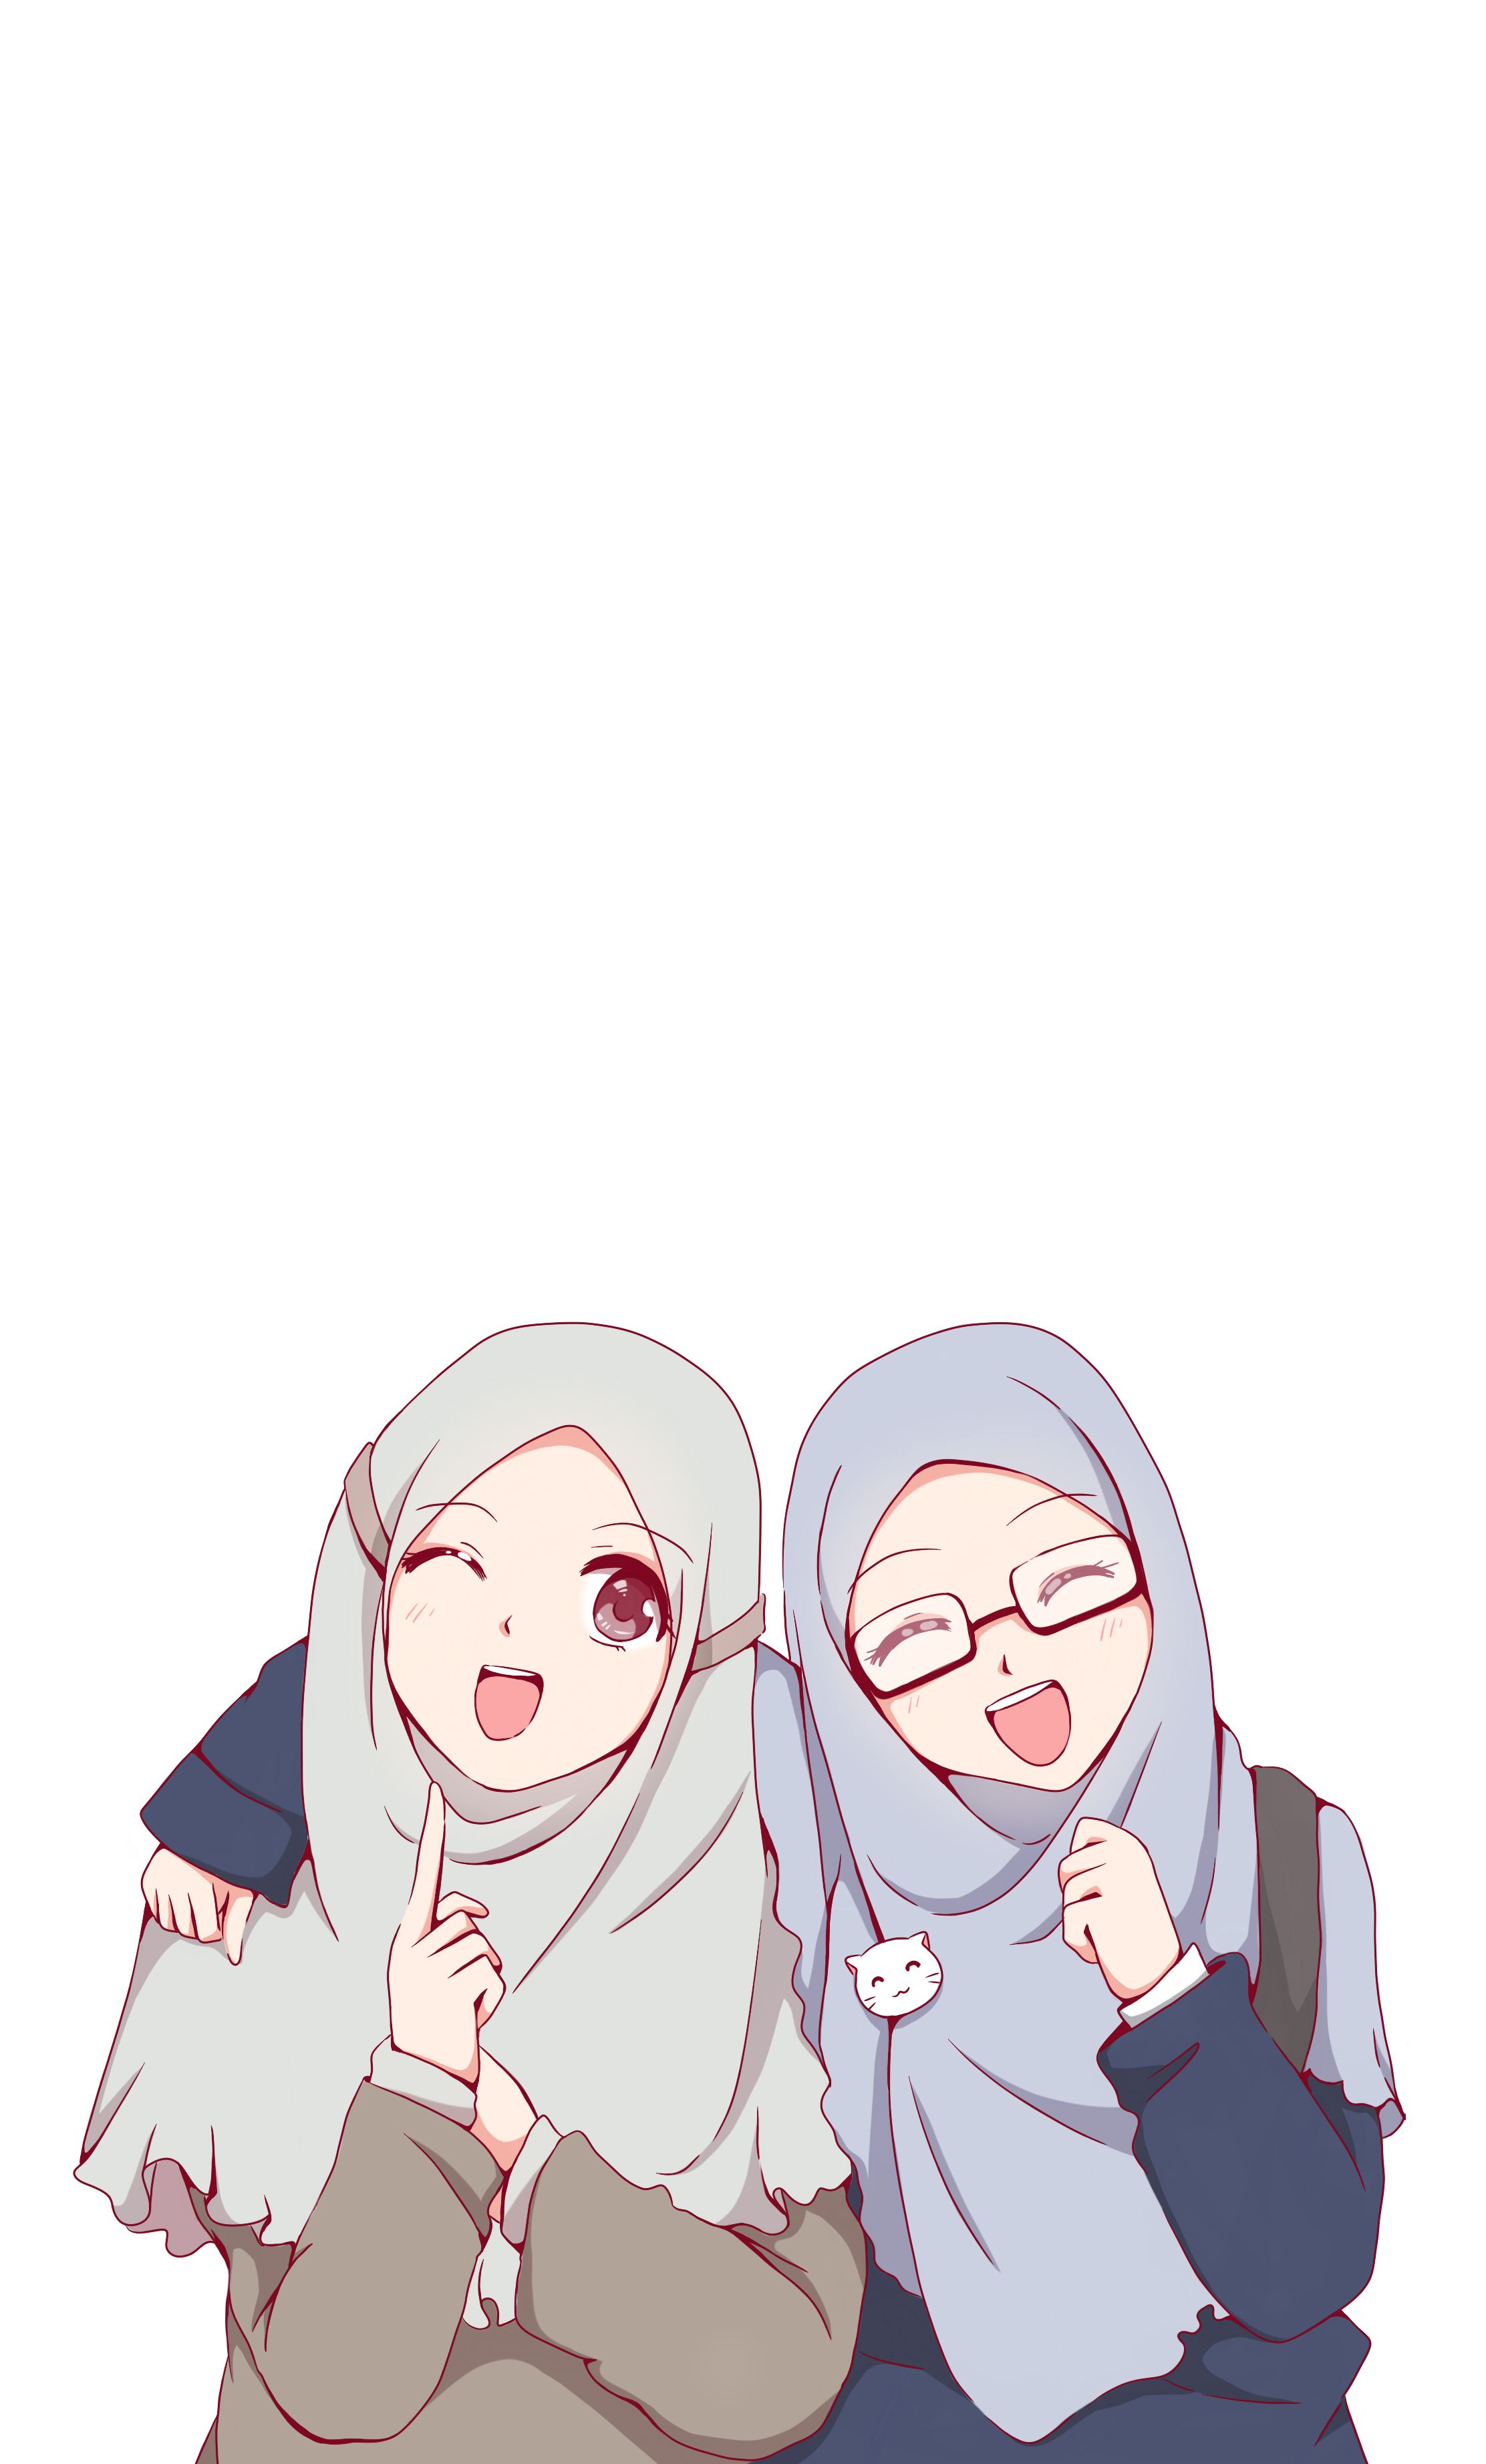 199 gambar dp bbm wanita muslimah berhijab syar i terbaru sumber : gambar kartun muslimah persahabatan 2 orang